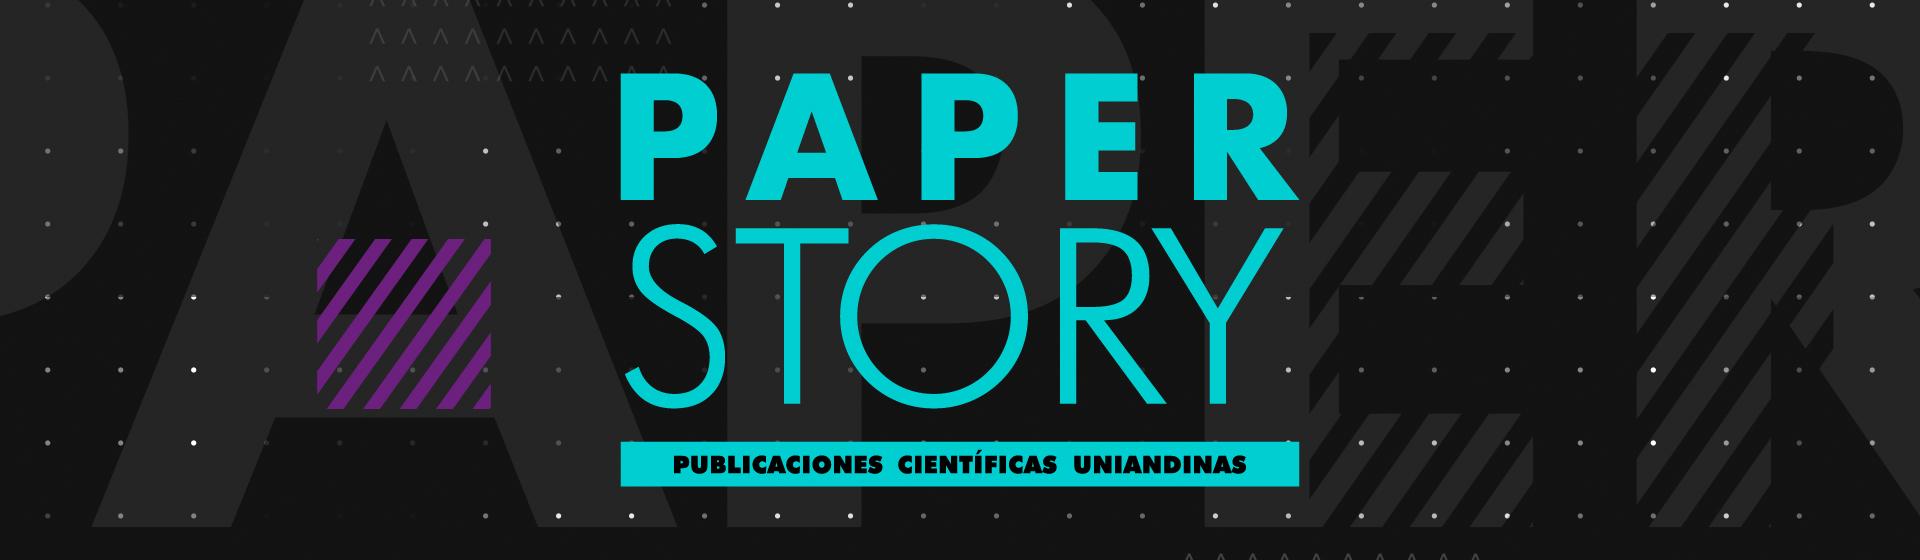 Paper Story: Publicaciones Científicas Uniandinas